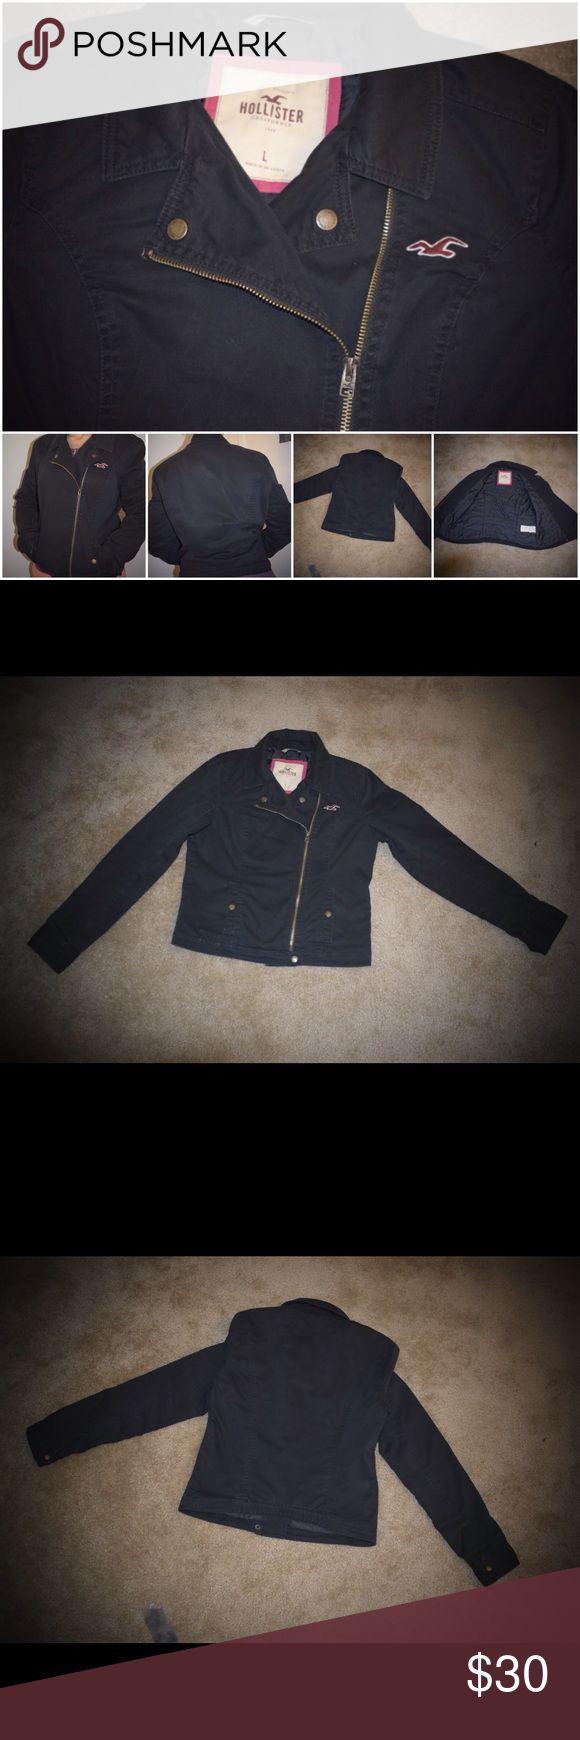 Hollister jacket women New like. Color  navy blue Hollister Jackets & Coats